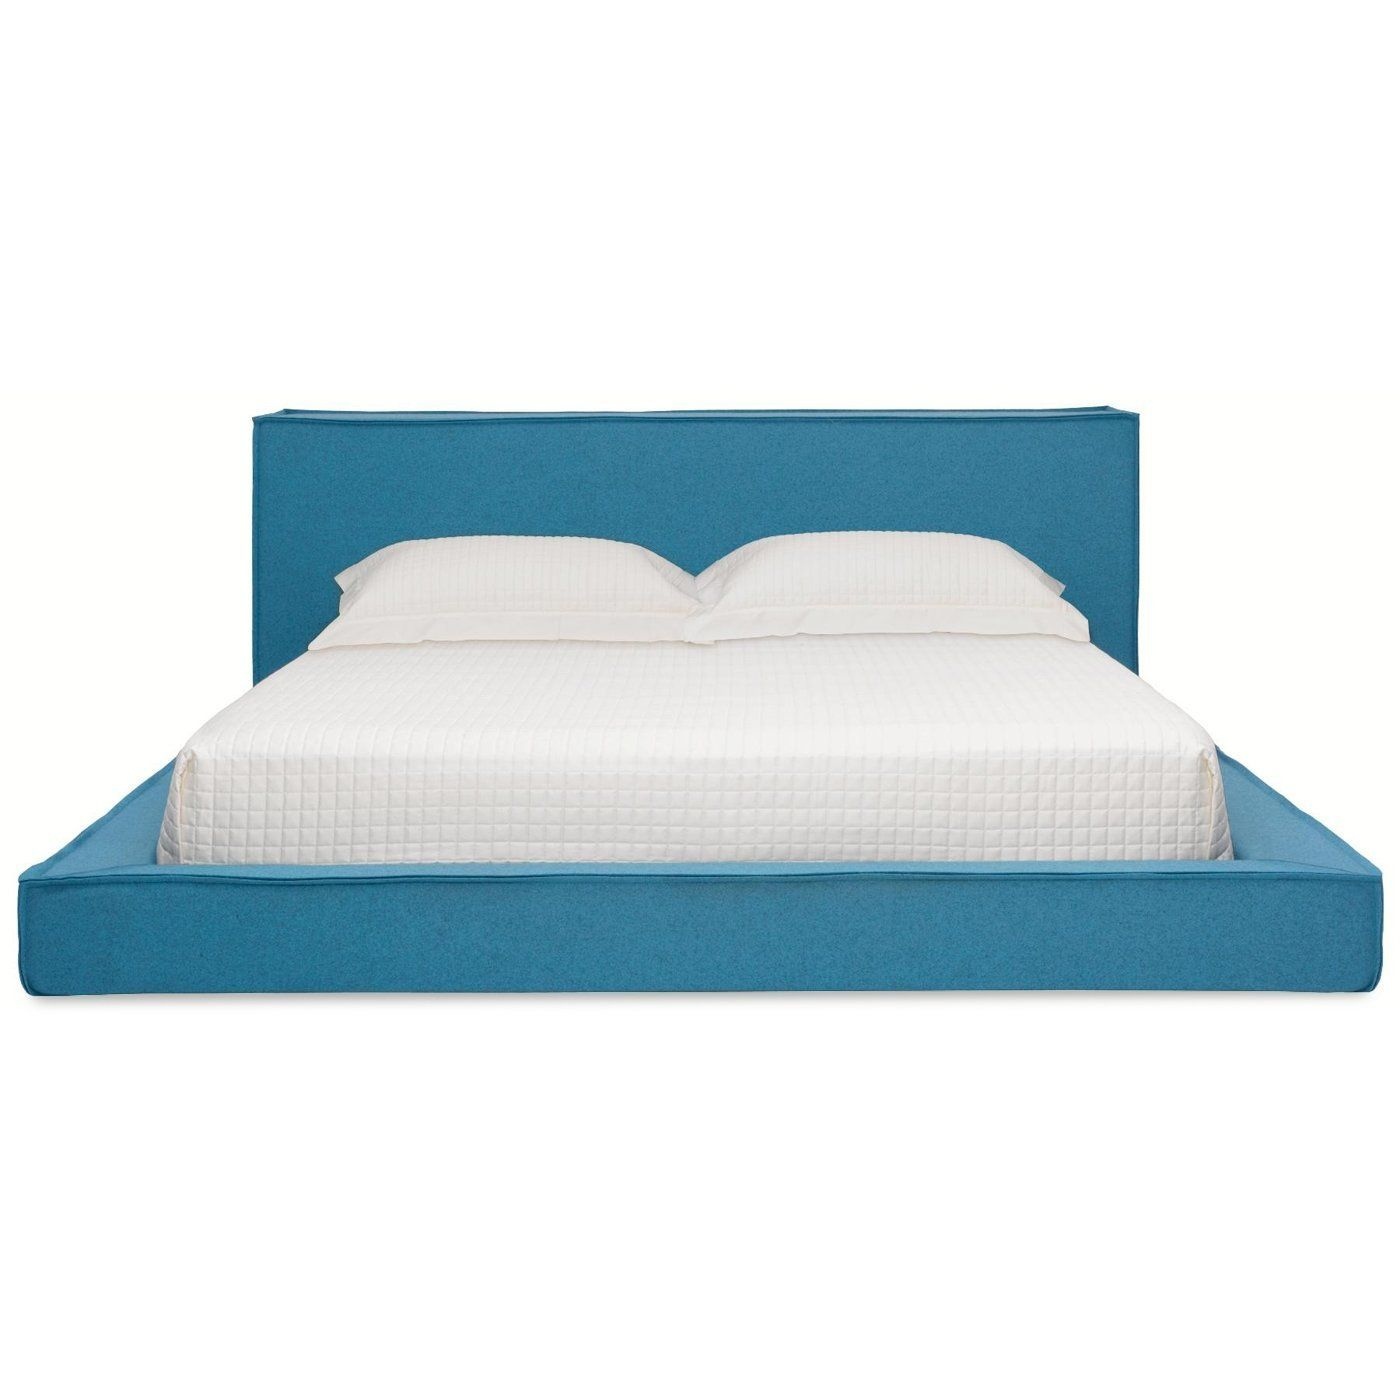 Amazon.com: Blu Dot Dodu King Bed, Aqua: Home & Kitchen | my \